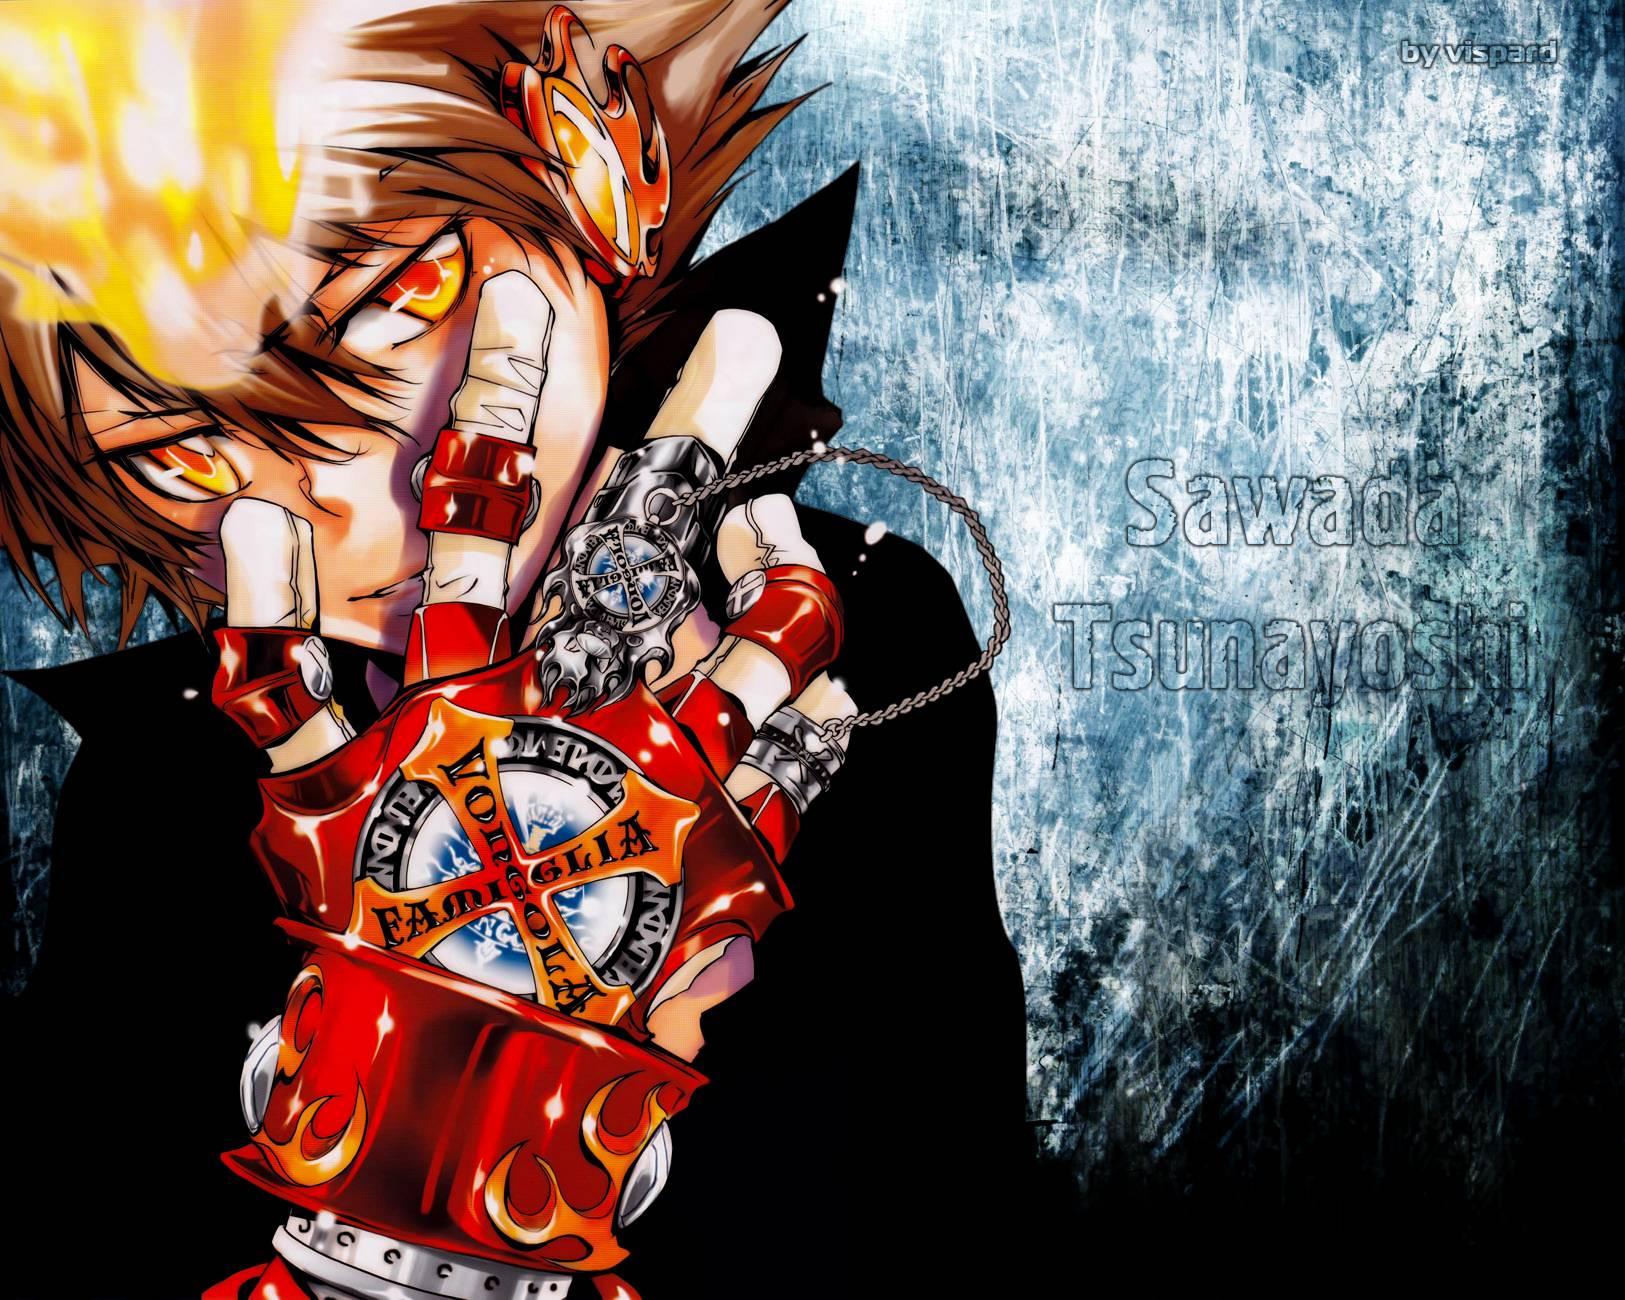 Pics Photos   Wallpapers Katekyo Hitman Reborn Wallpaper 1625x1300